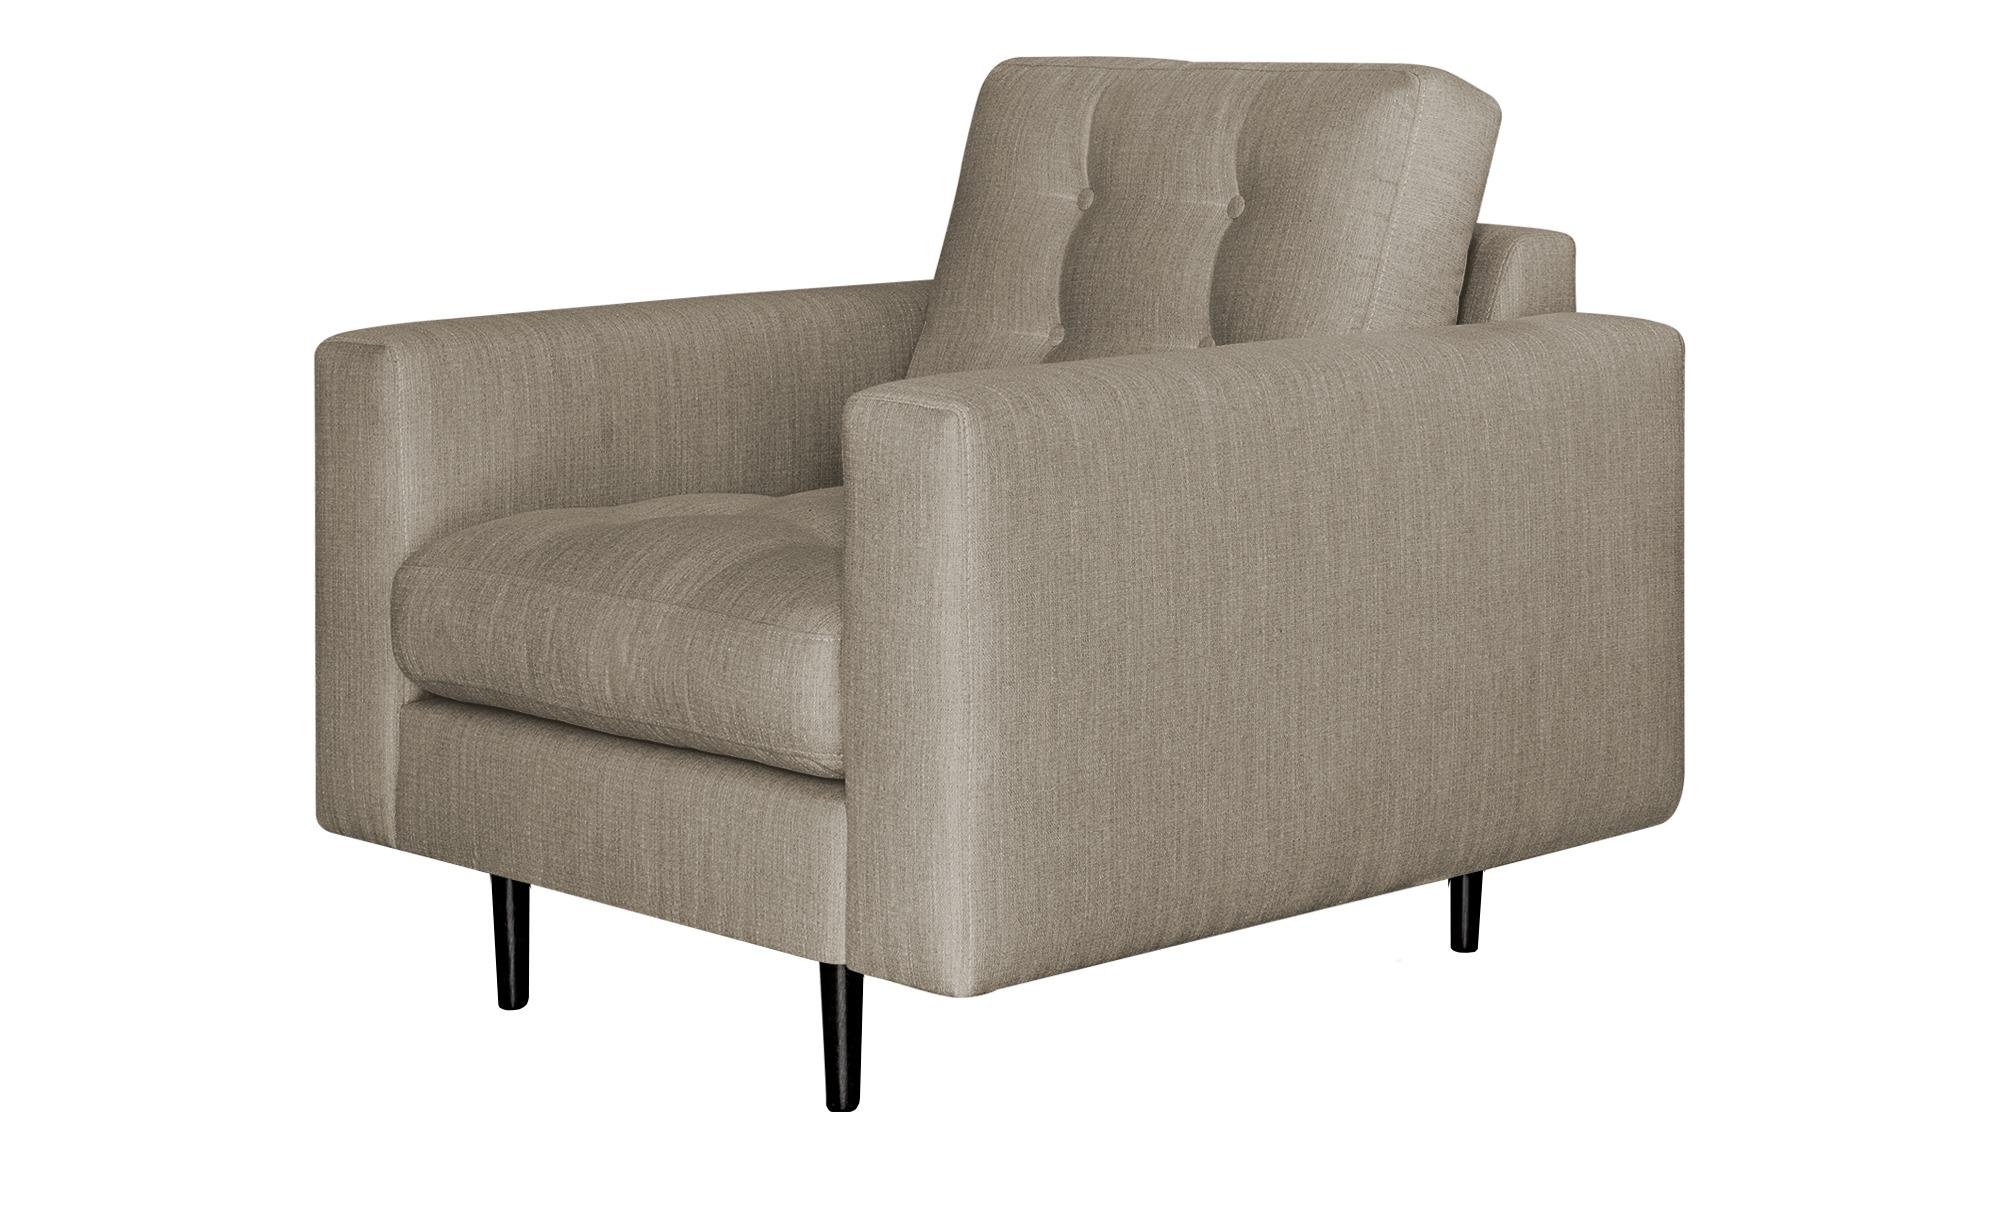 Gray & Jones Sessel  Gypsy ¦ beige ¦ Maße (cm): B: 97 H: 90 T: 92 Polstermöbel > Sessel > Polstersessel - Höffner